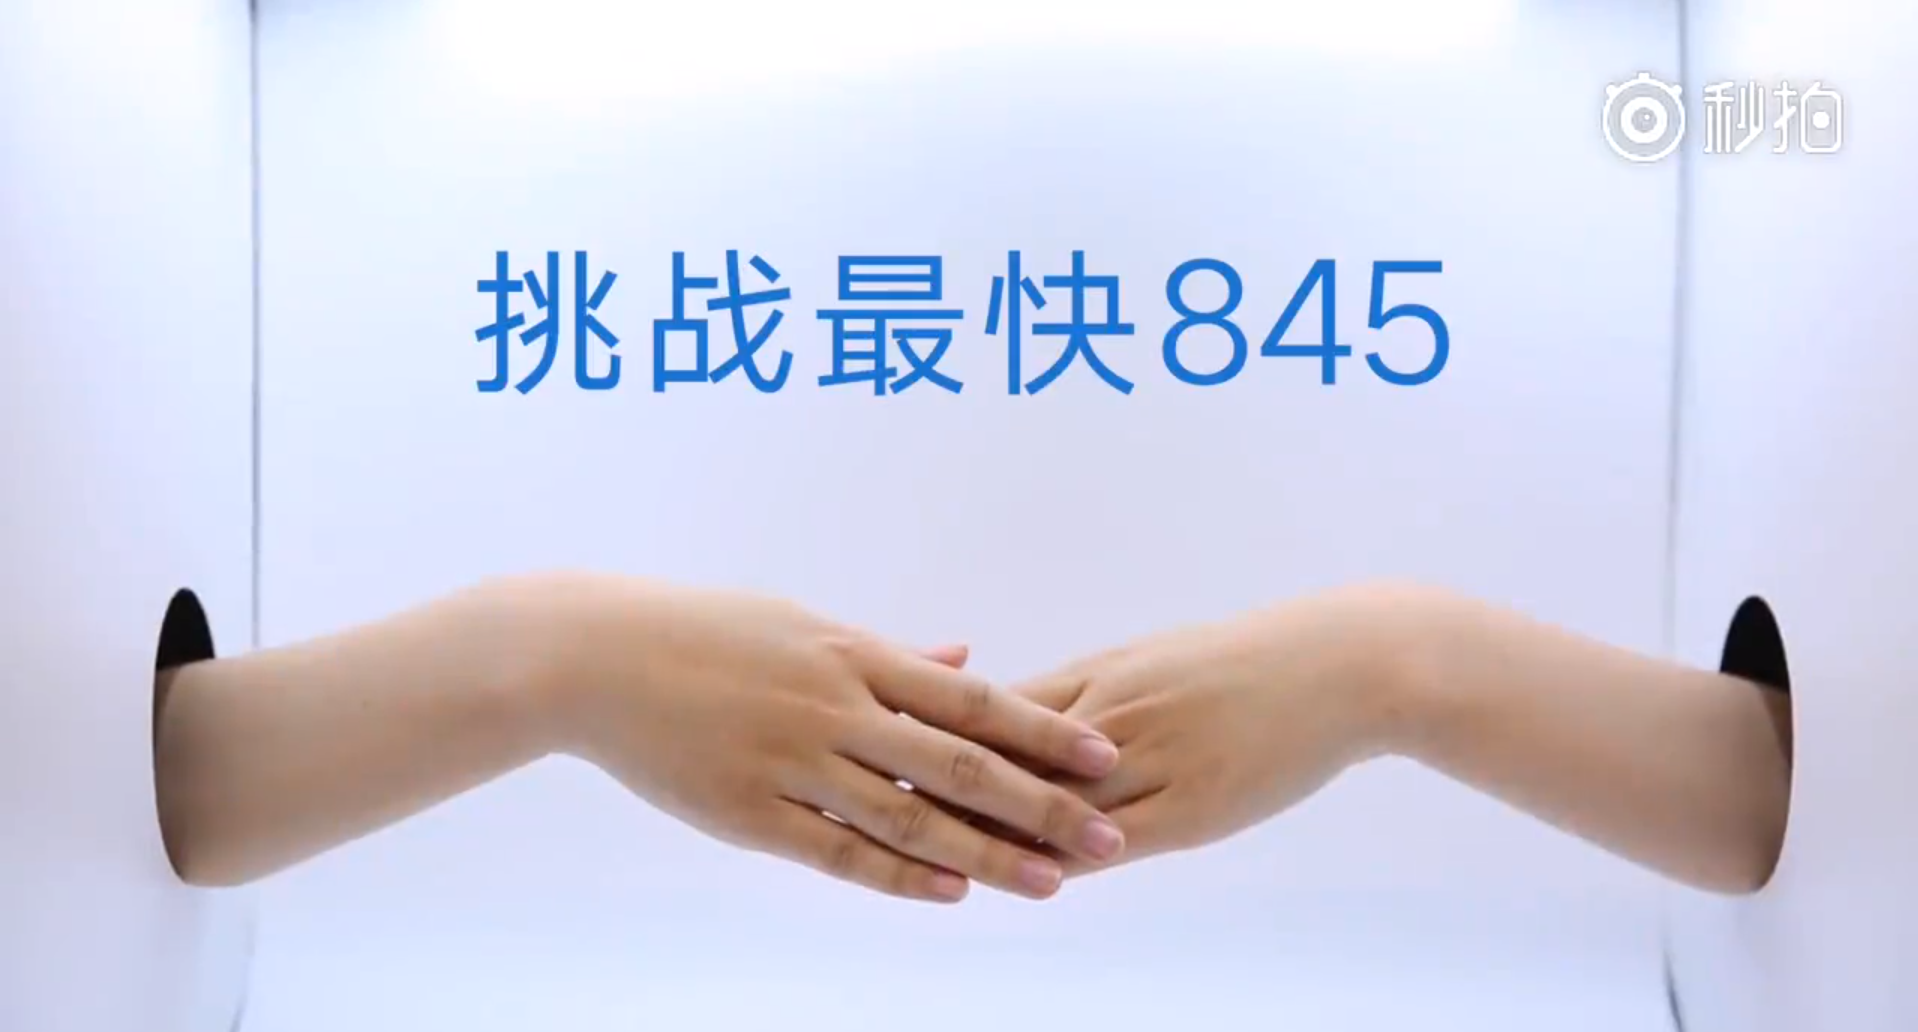 Xiaomi I miesza 2s snapdragon 845